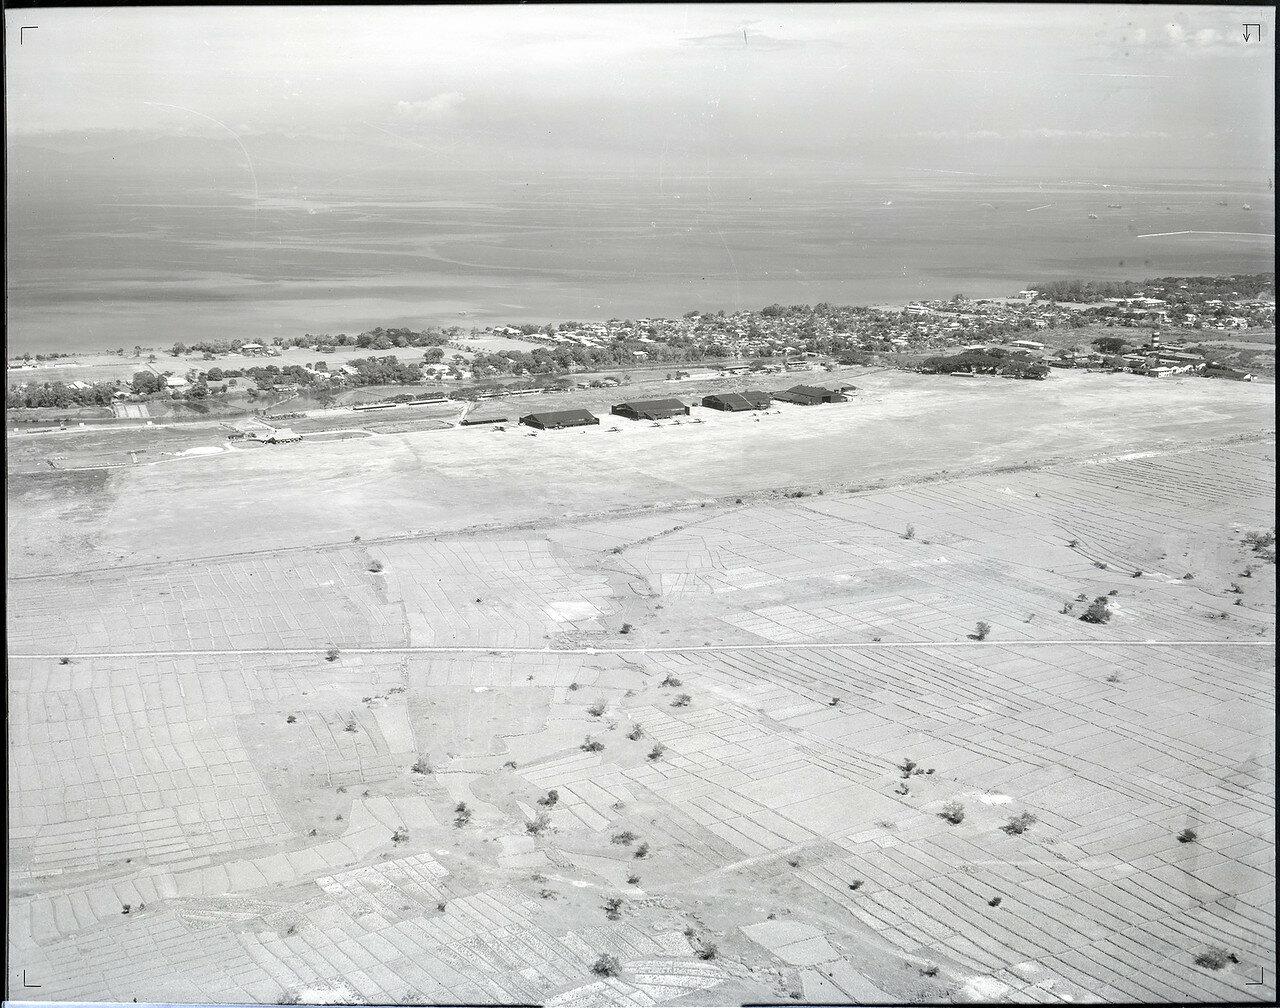 Филиппинский аэродром Николс Филд